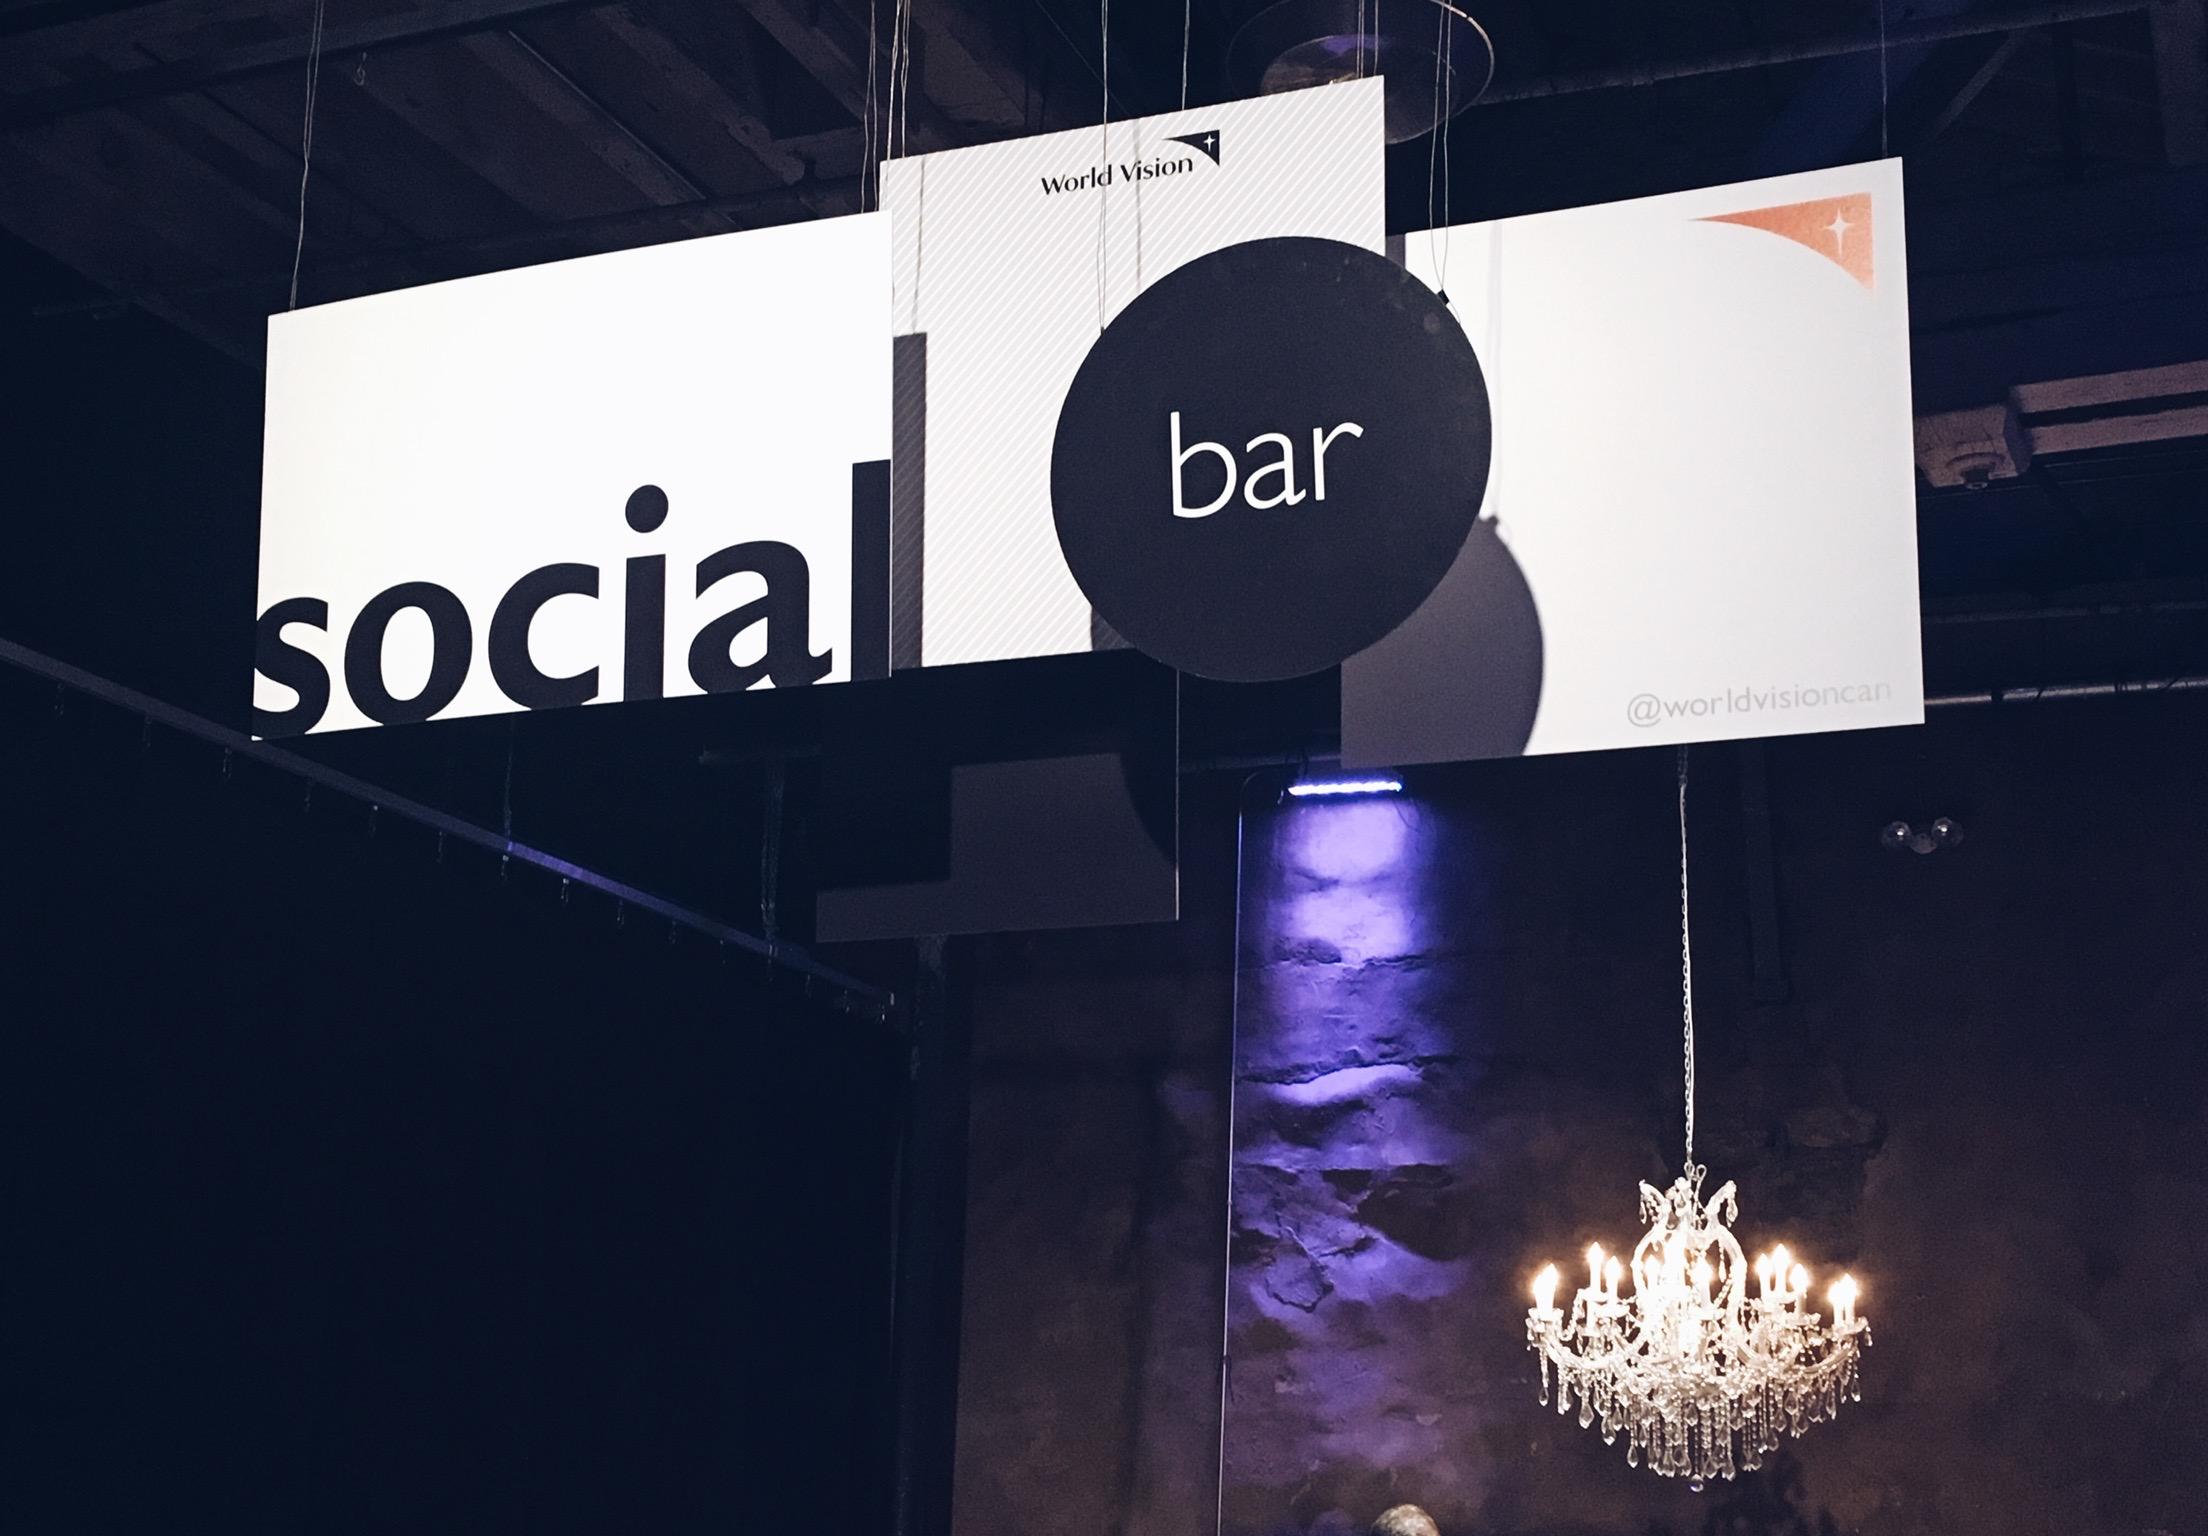 Social Bar | Tall Girl Meets World